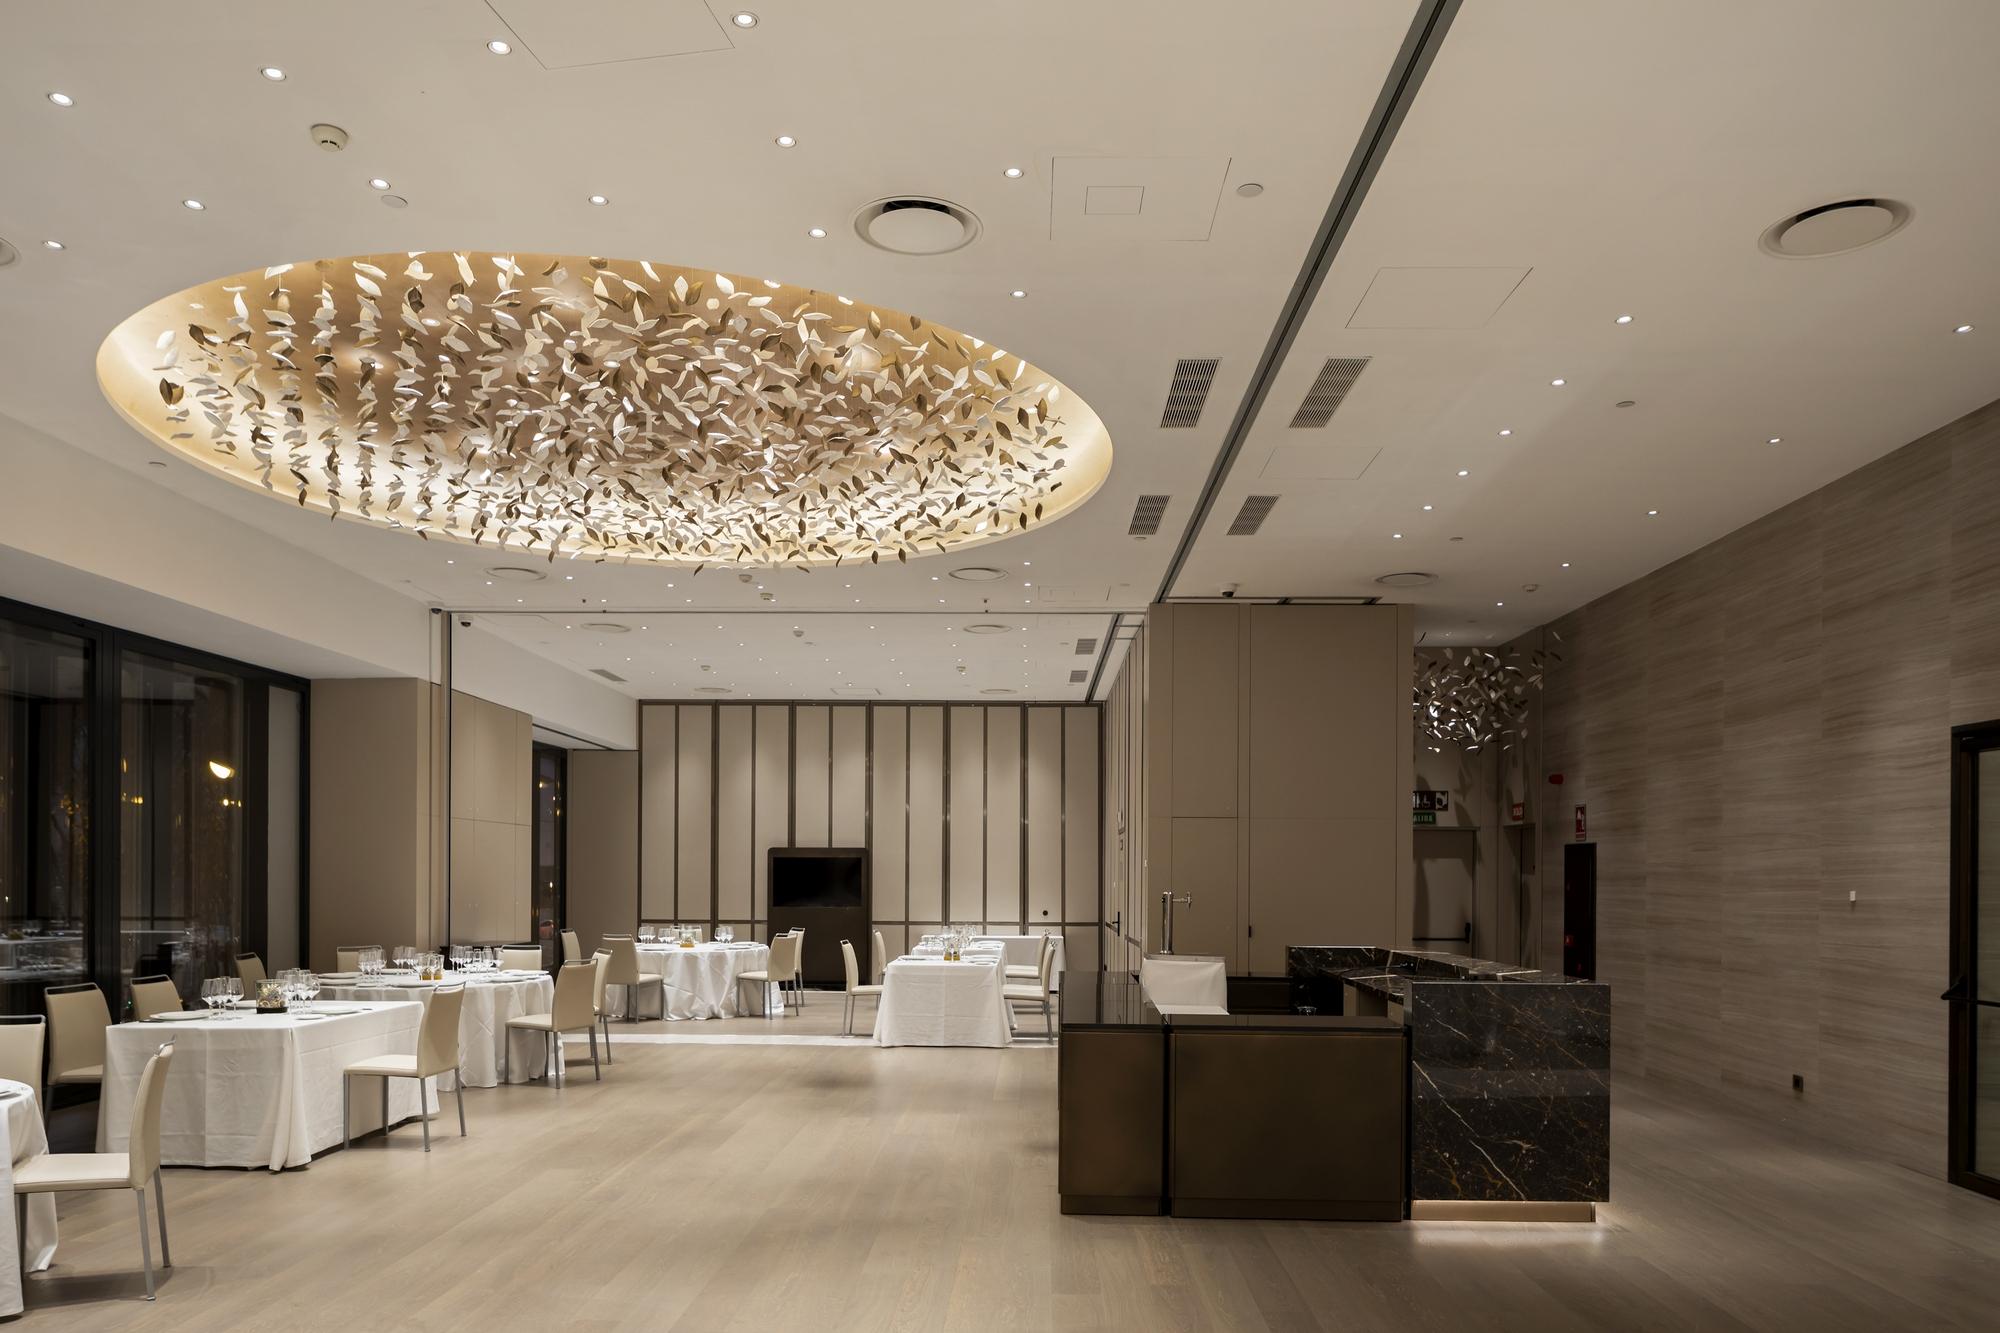 sala di un hotel illuminata